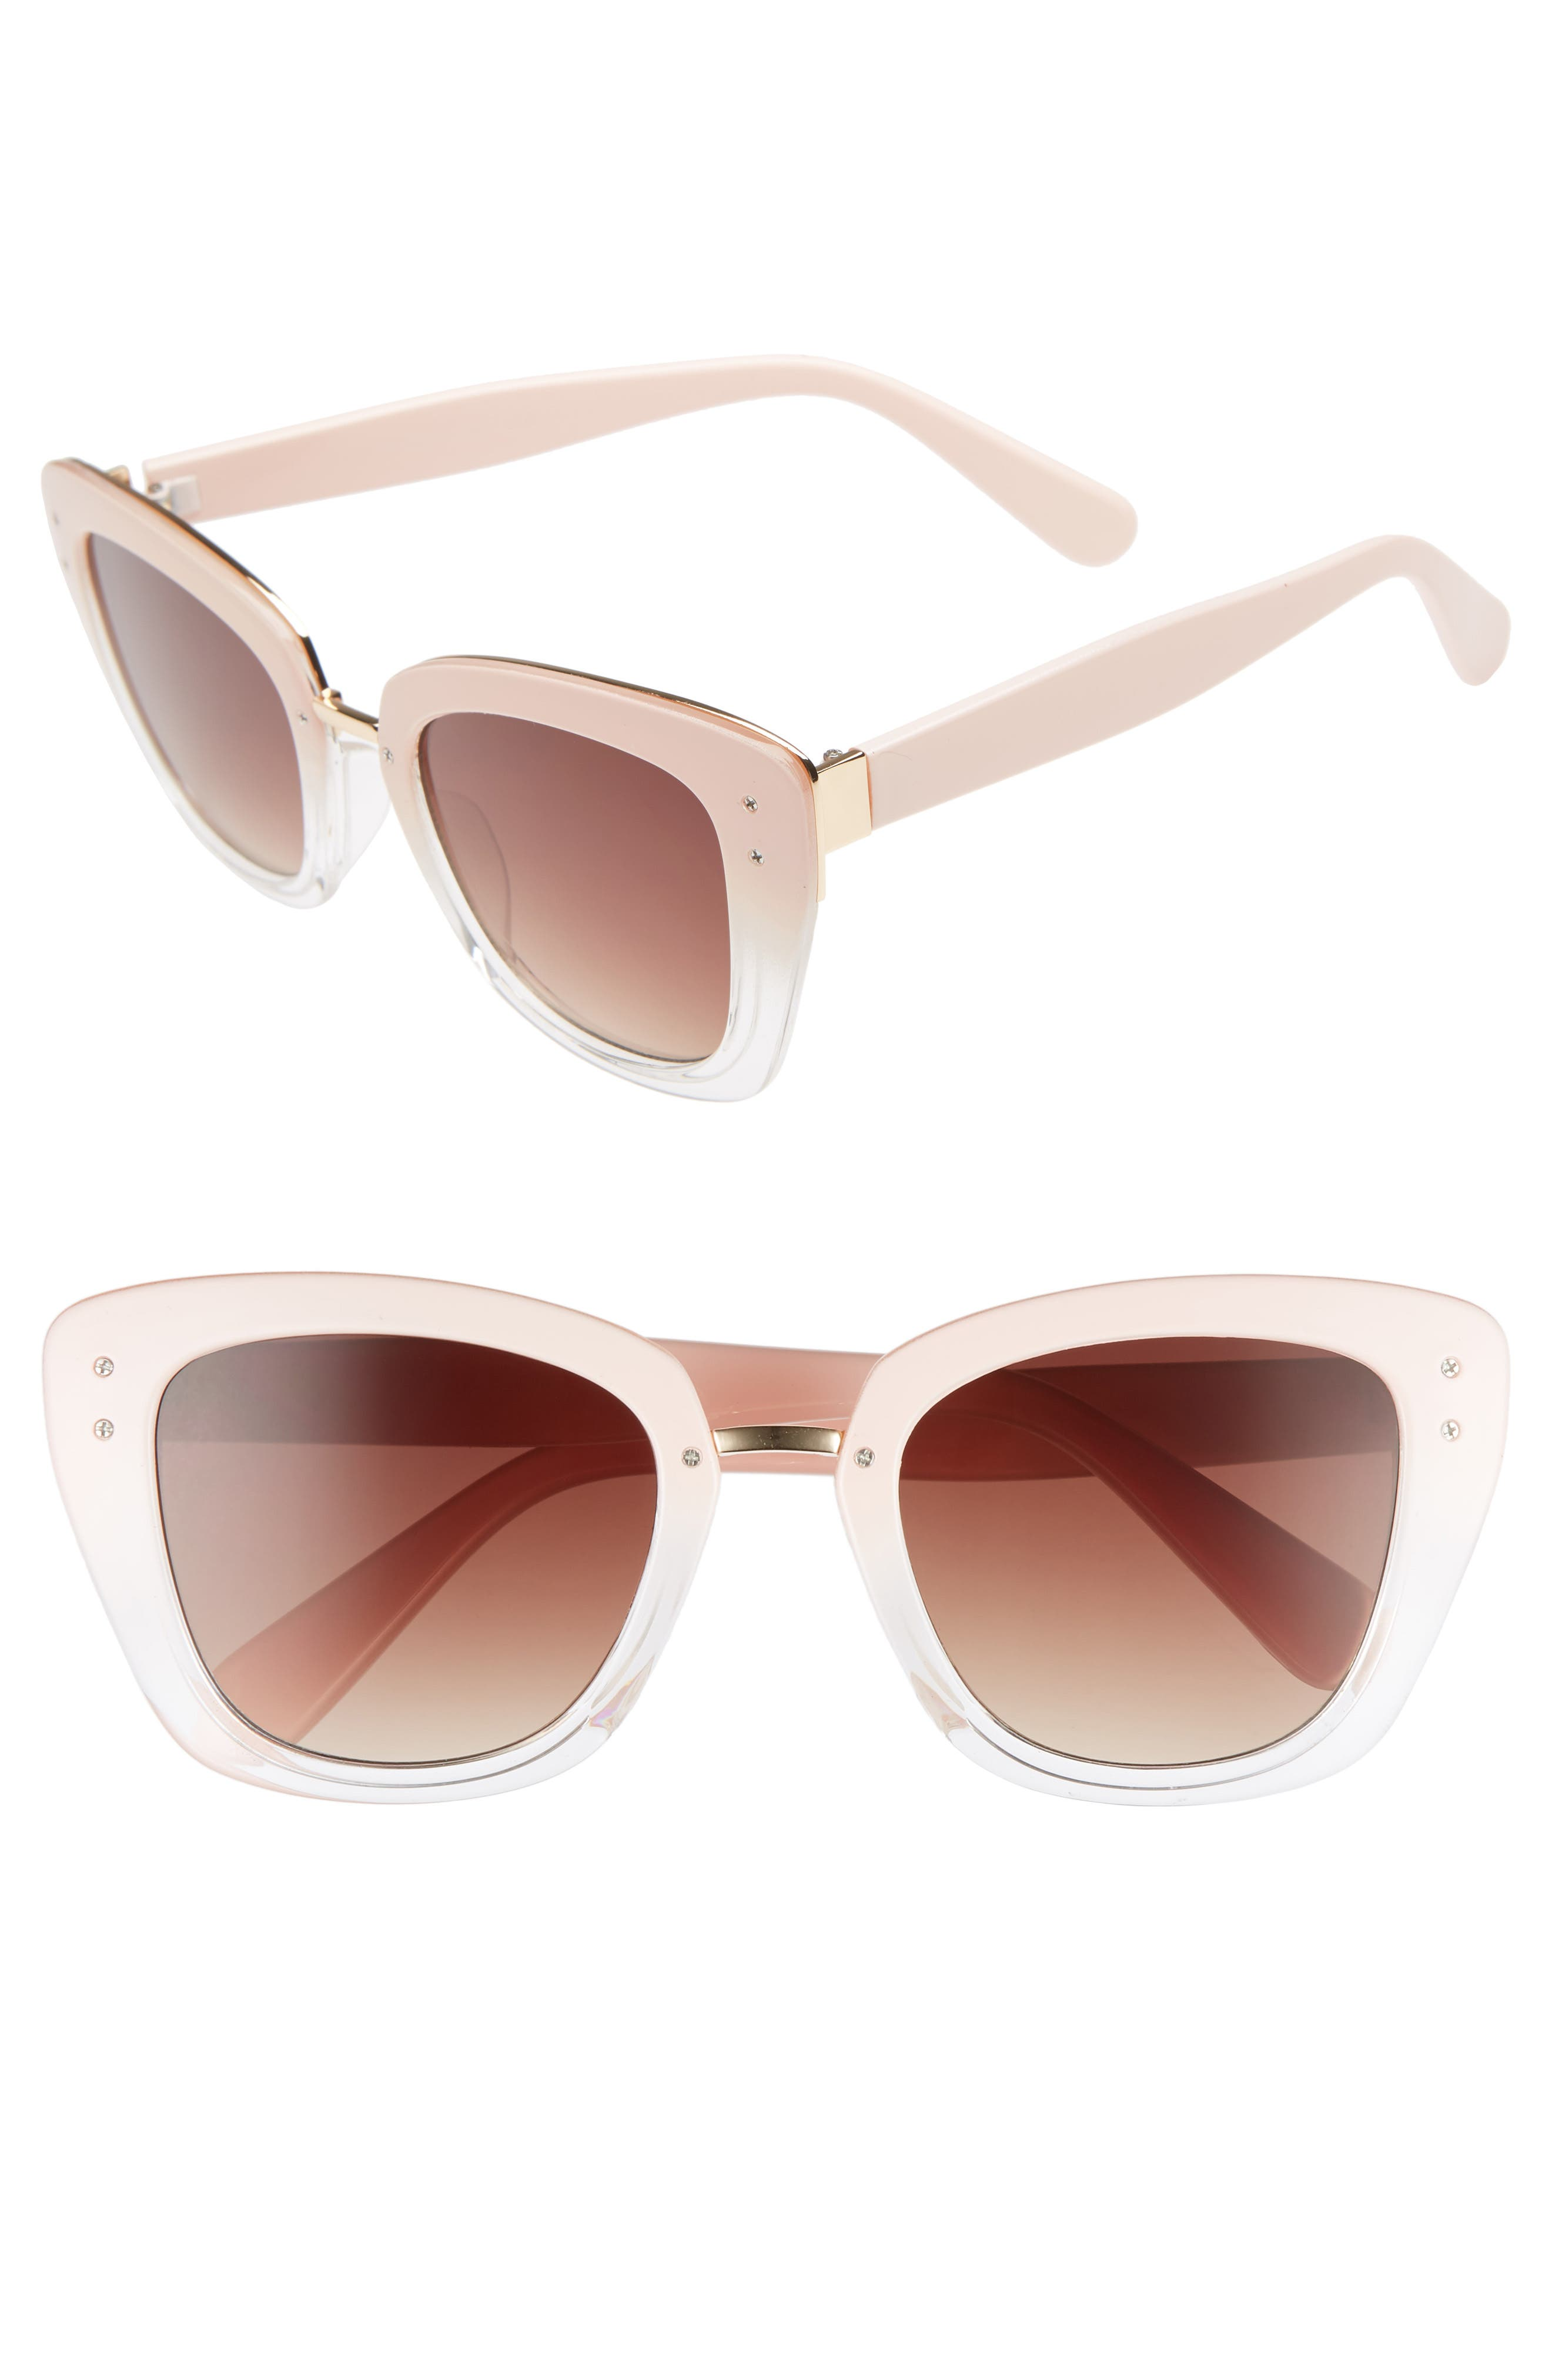 51mm Ombré Square Sunglasses,                         Main,                         color, Pink/ Clear